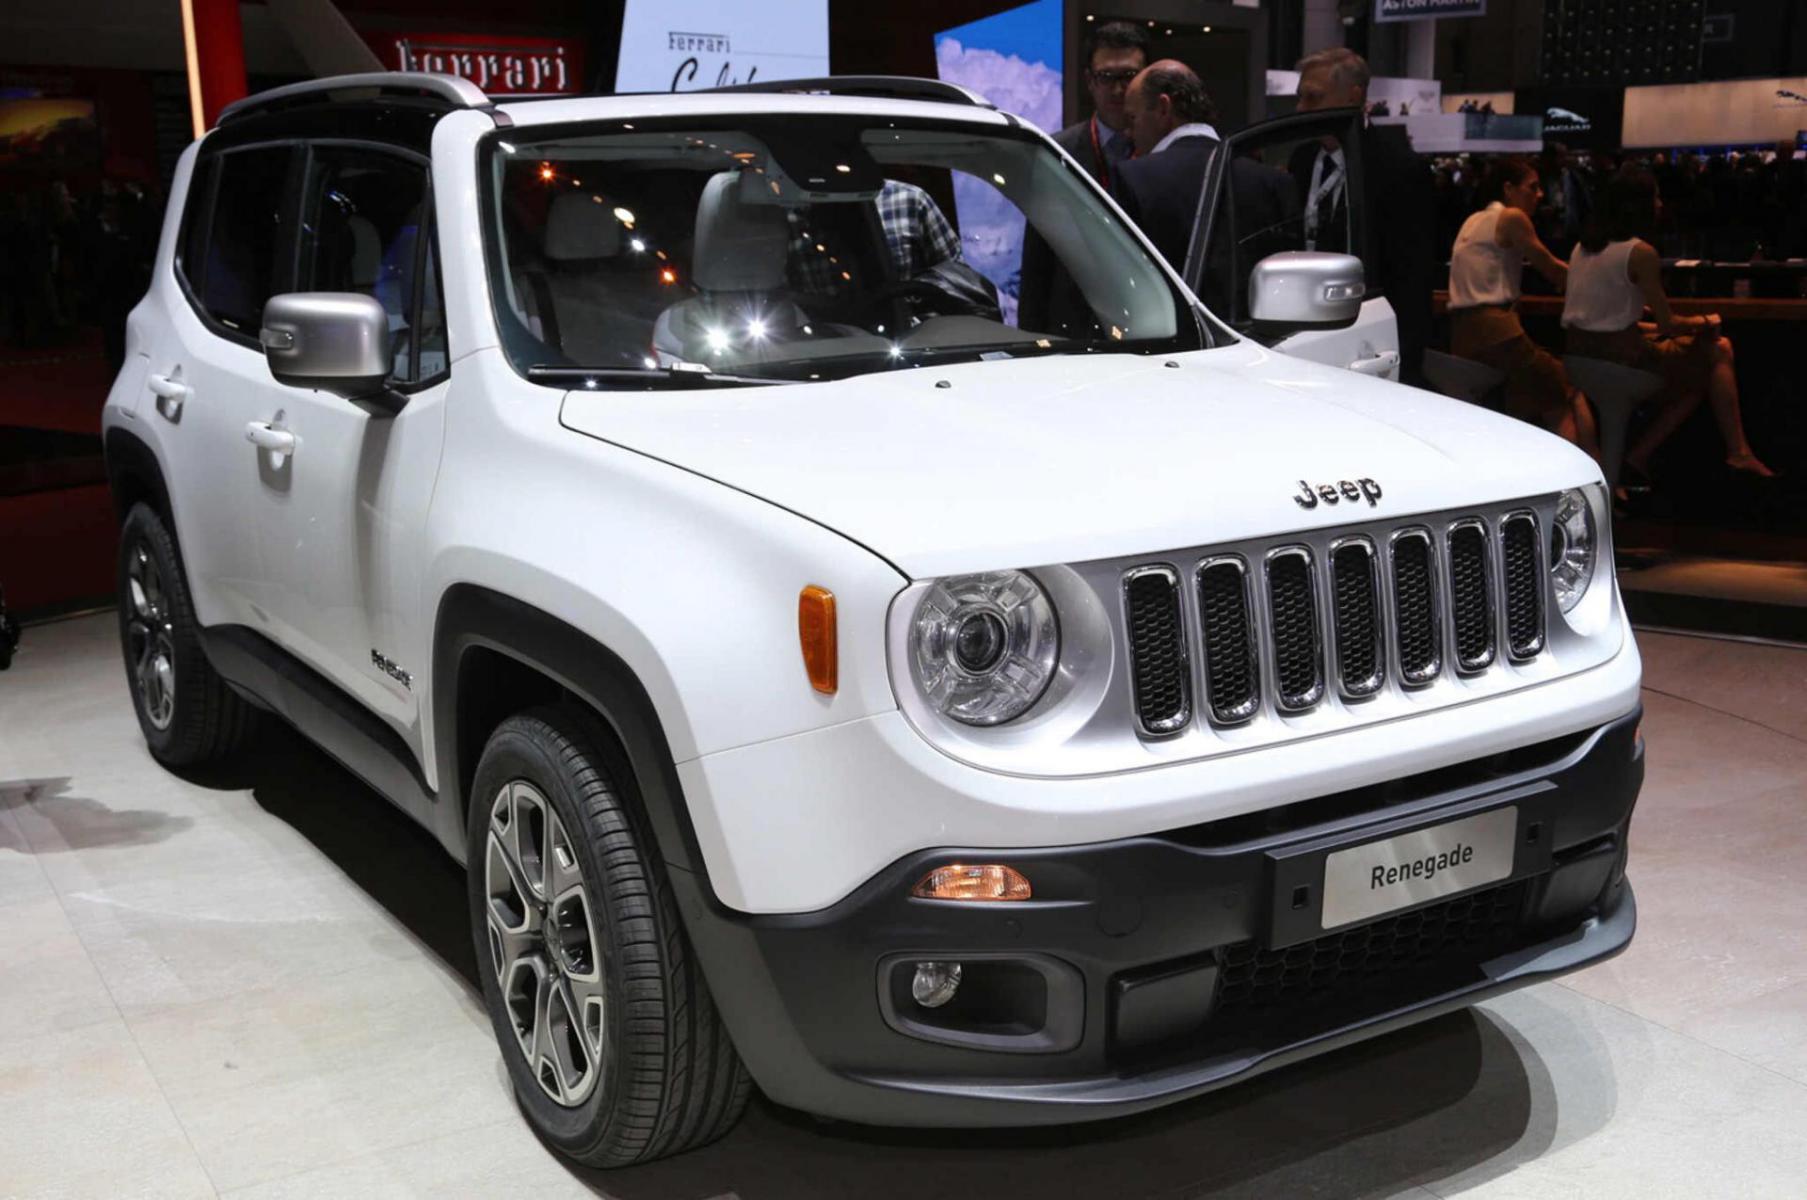 Bark Brown Ski Grey Jeep Renegade Forum